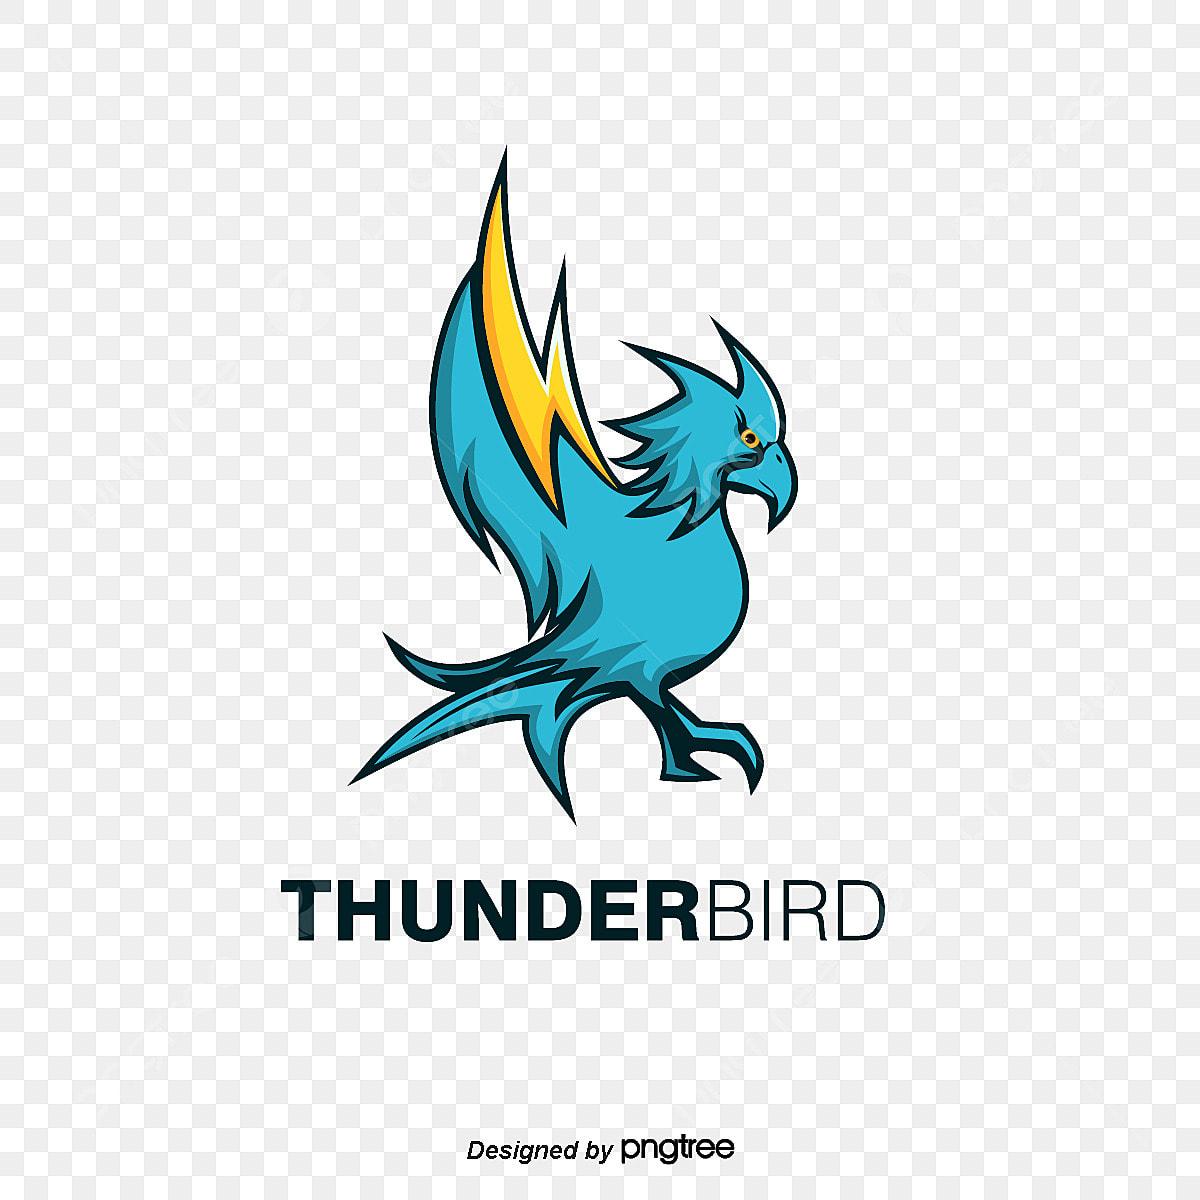 Os Icones Azuis Thunderbird Animal Indian O Icone Arquivo Png E